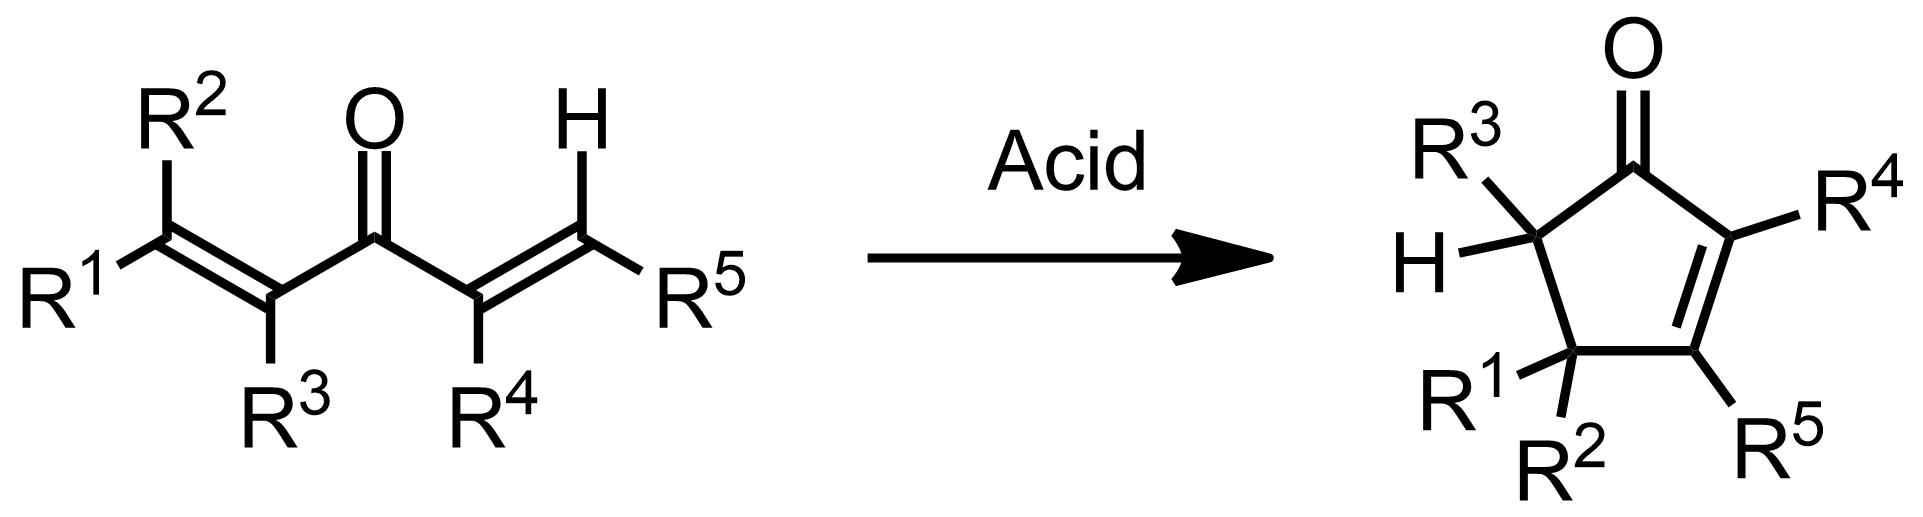 Schematic representation of the Nazarov Cyclization Reaction.